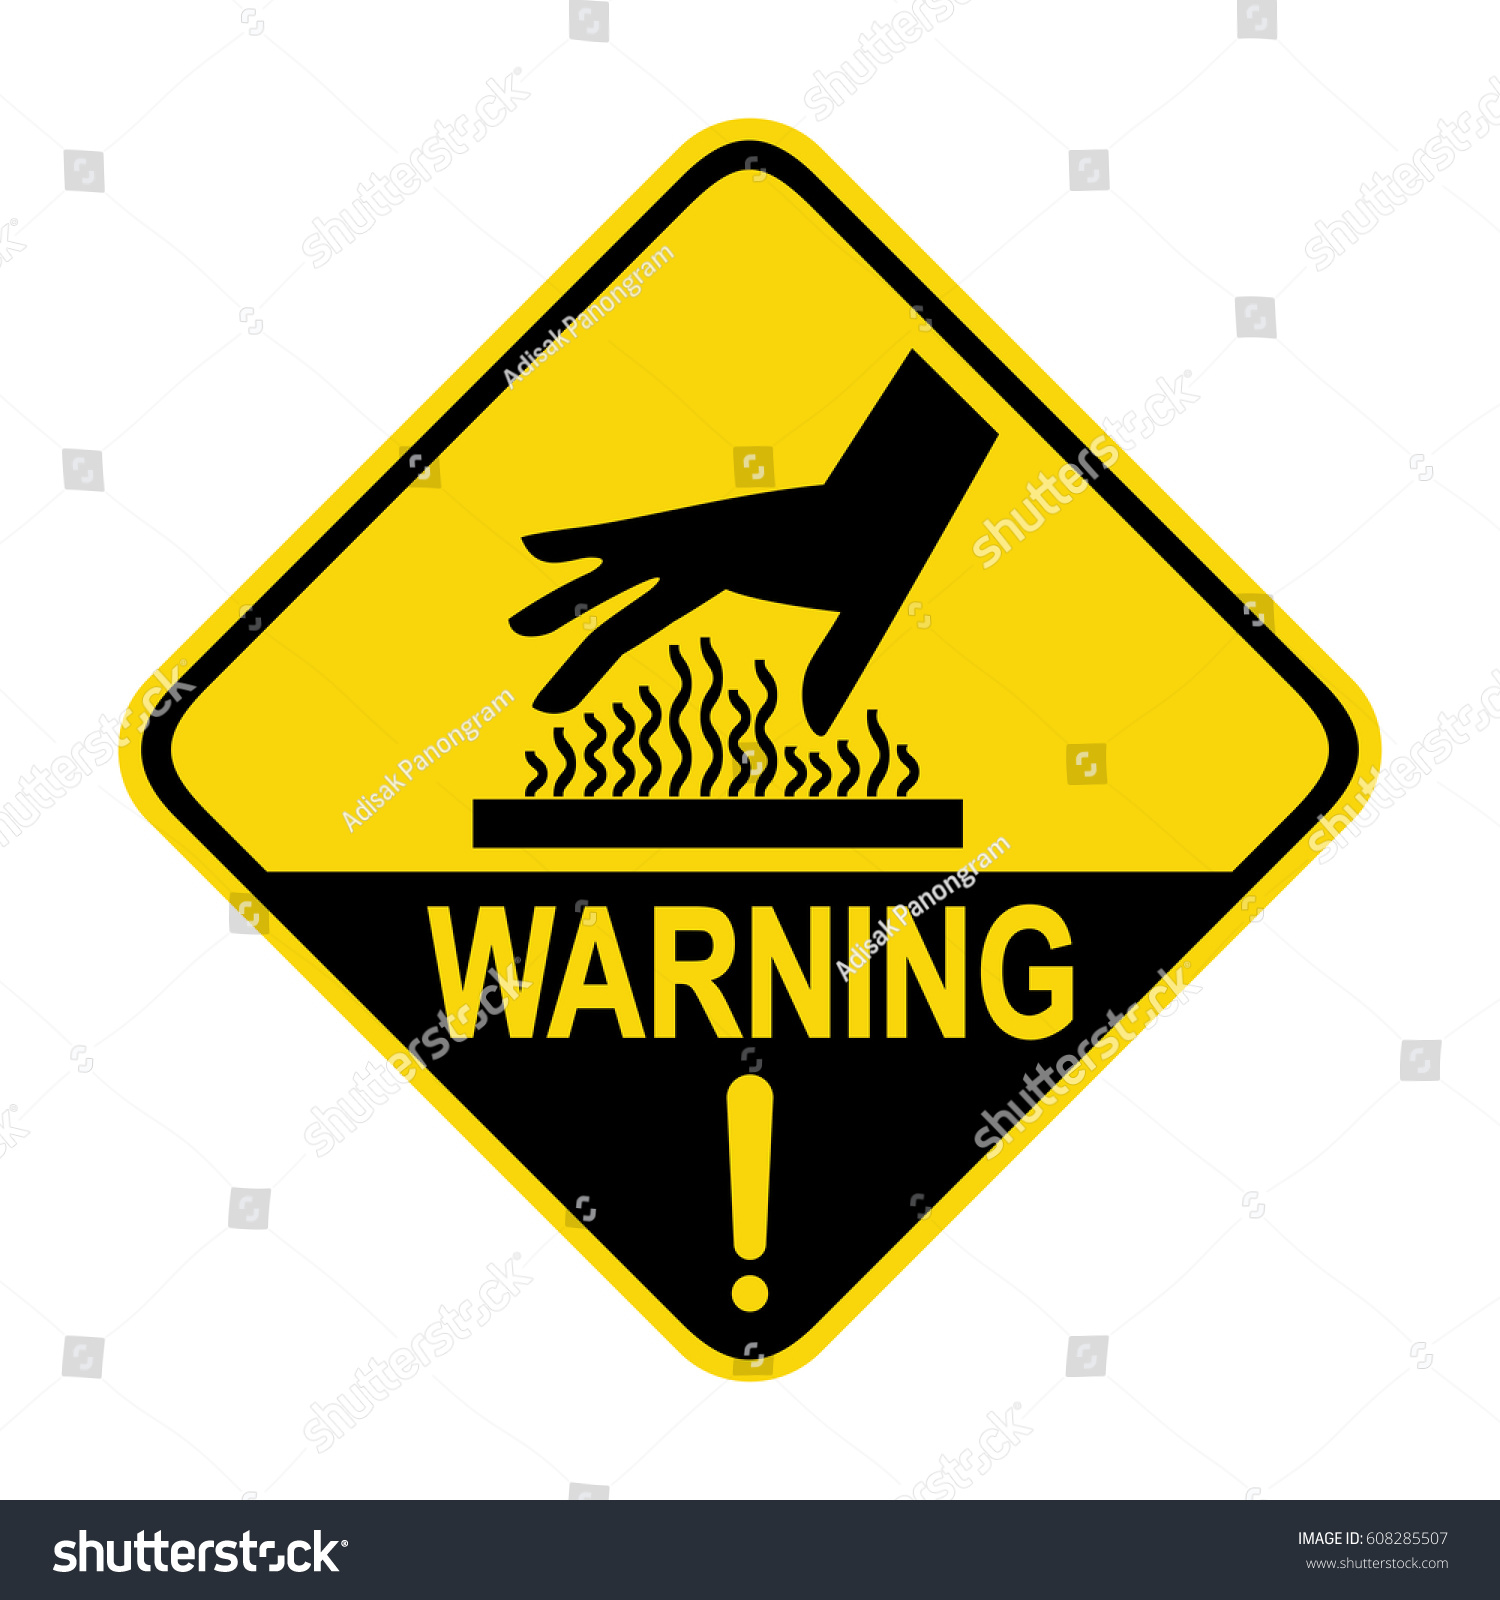 Warning hot surface sign symbol illustration stock vector warning hot surface sign symbol illustration buycottarizona Image collections